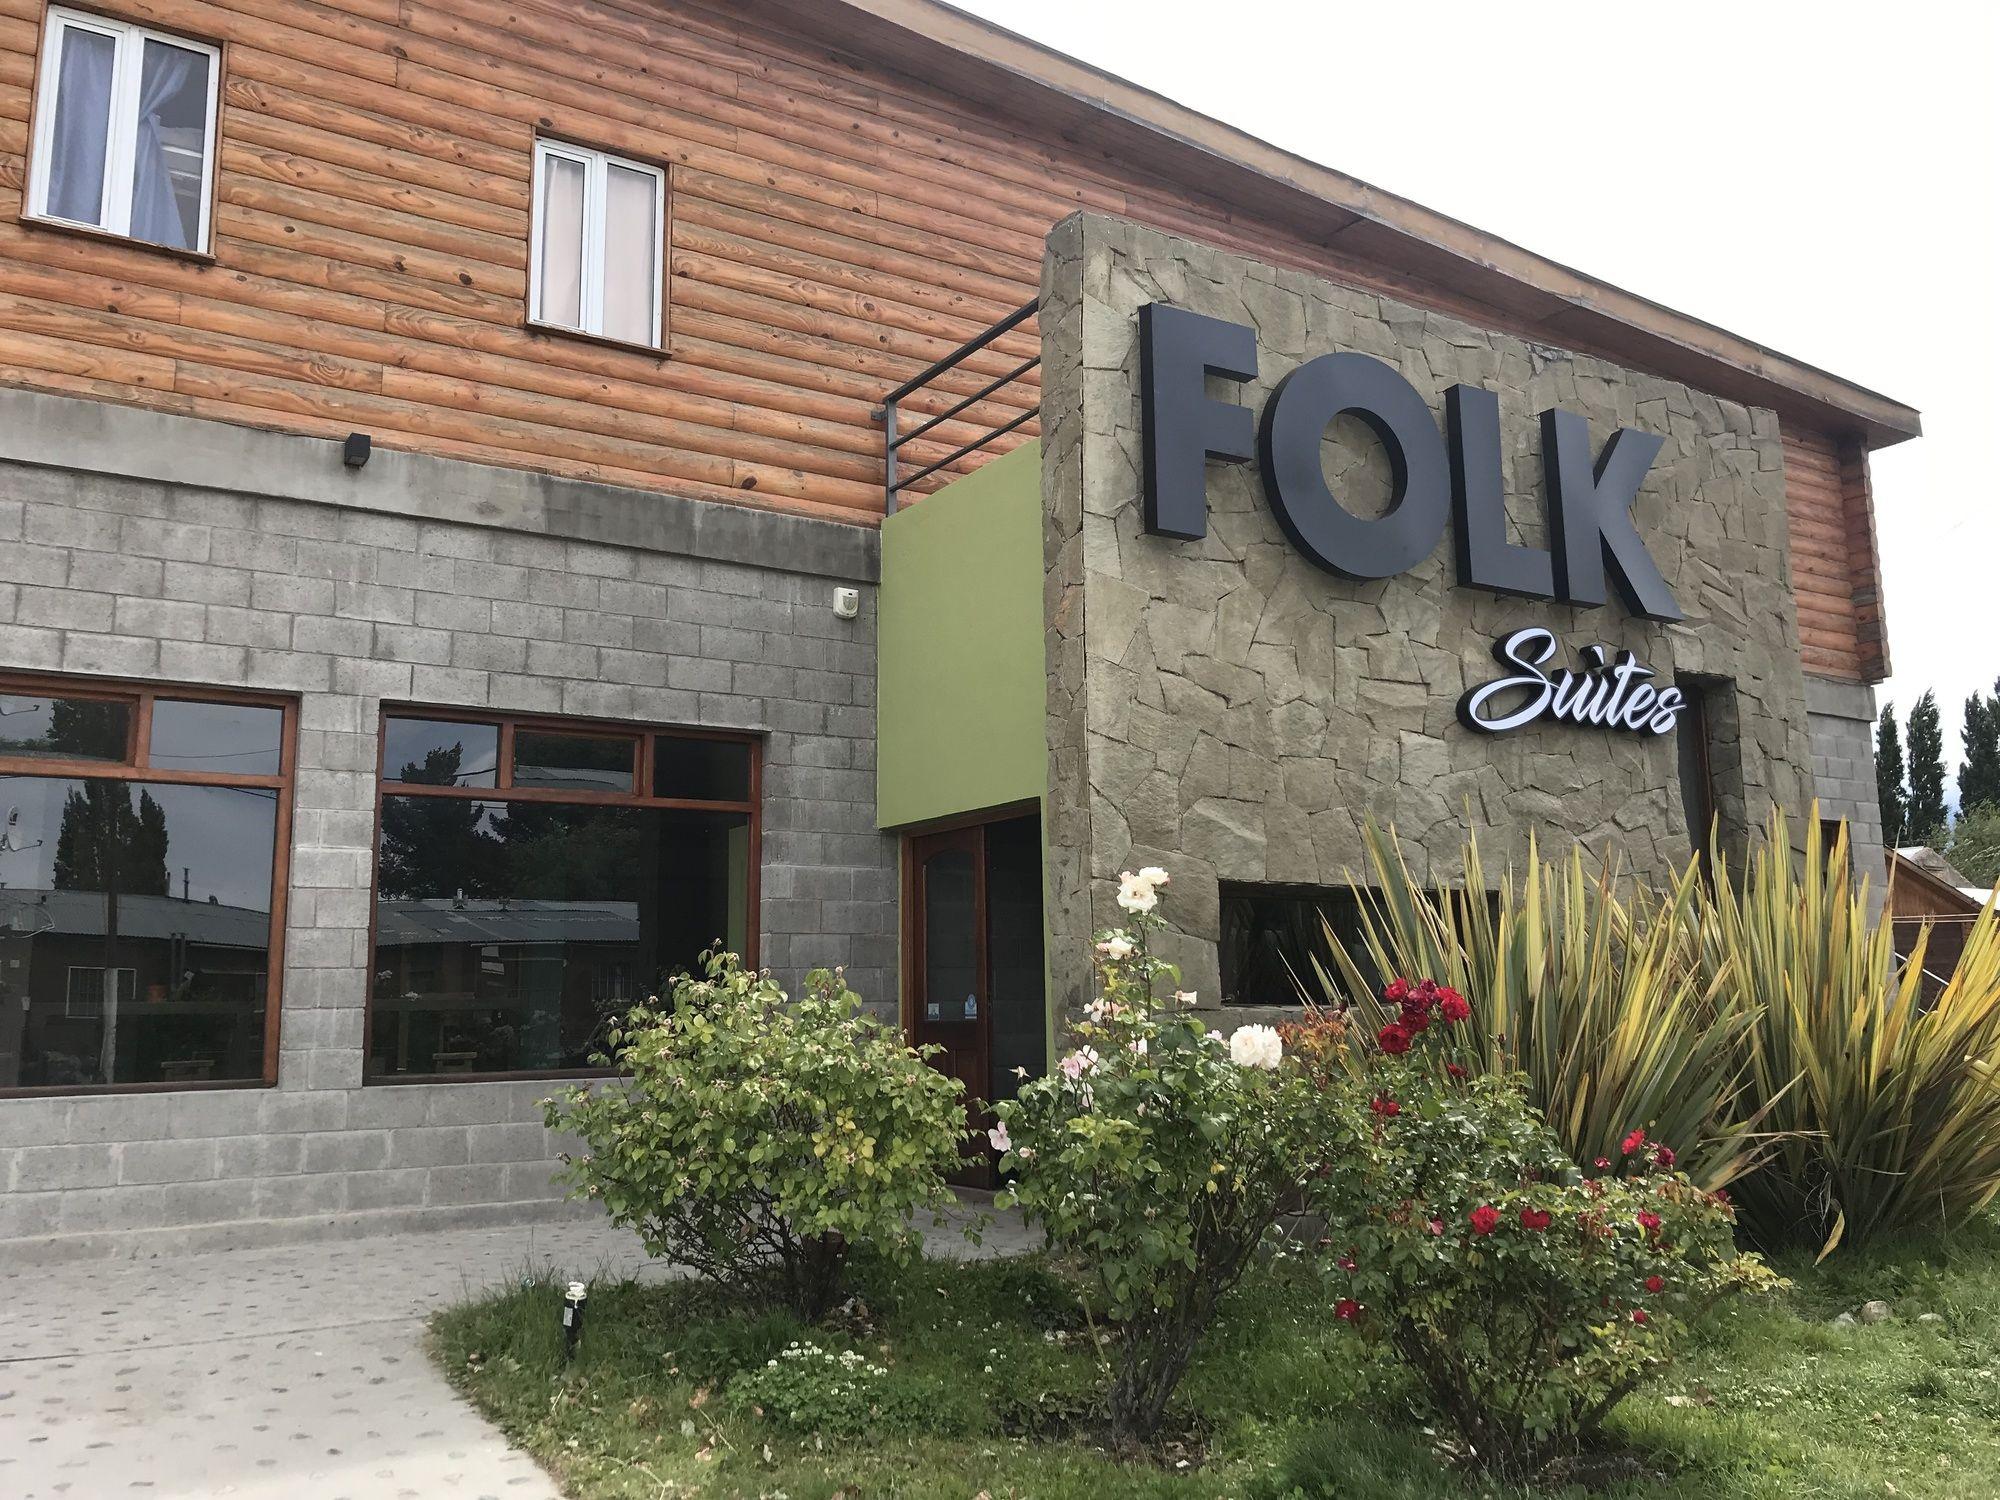 Folk Suites